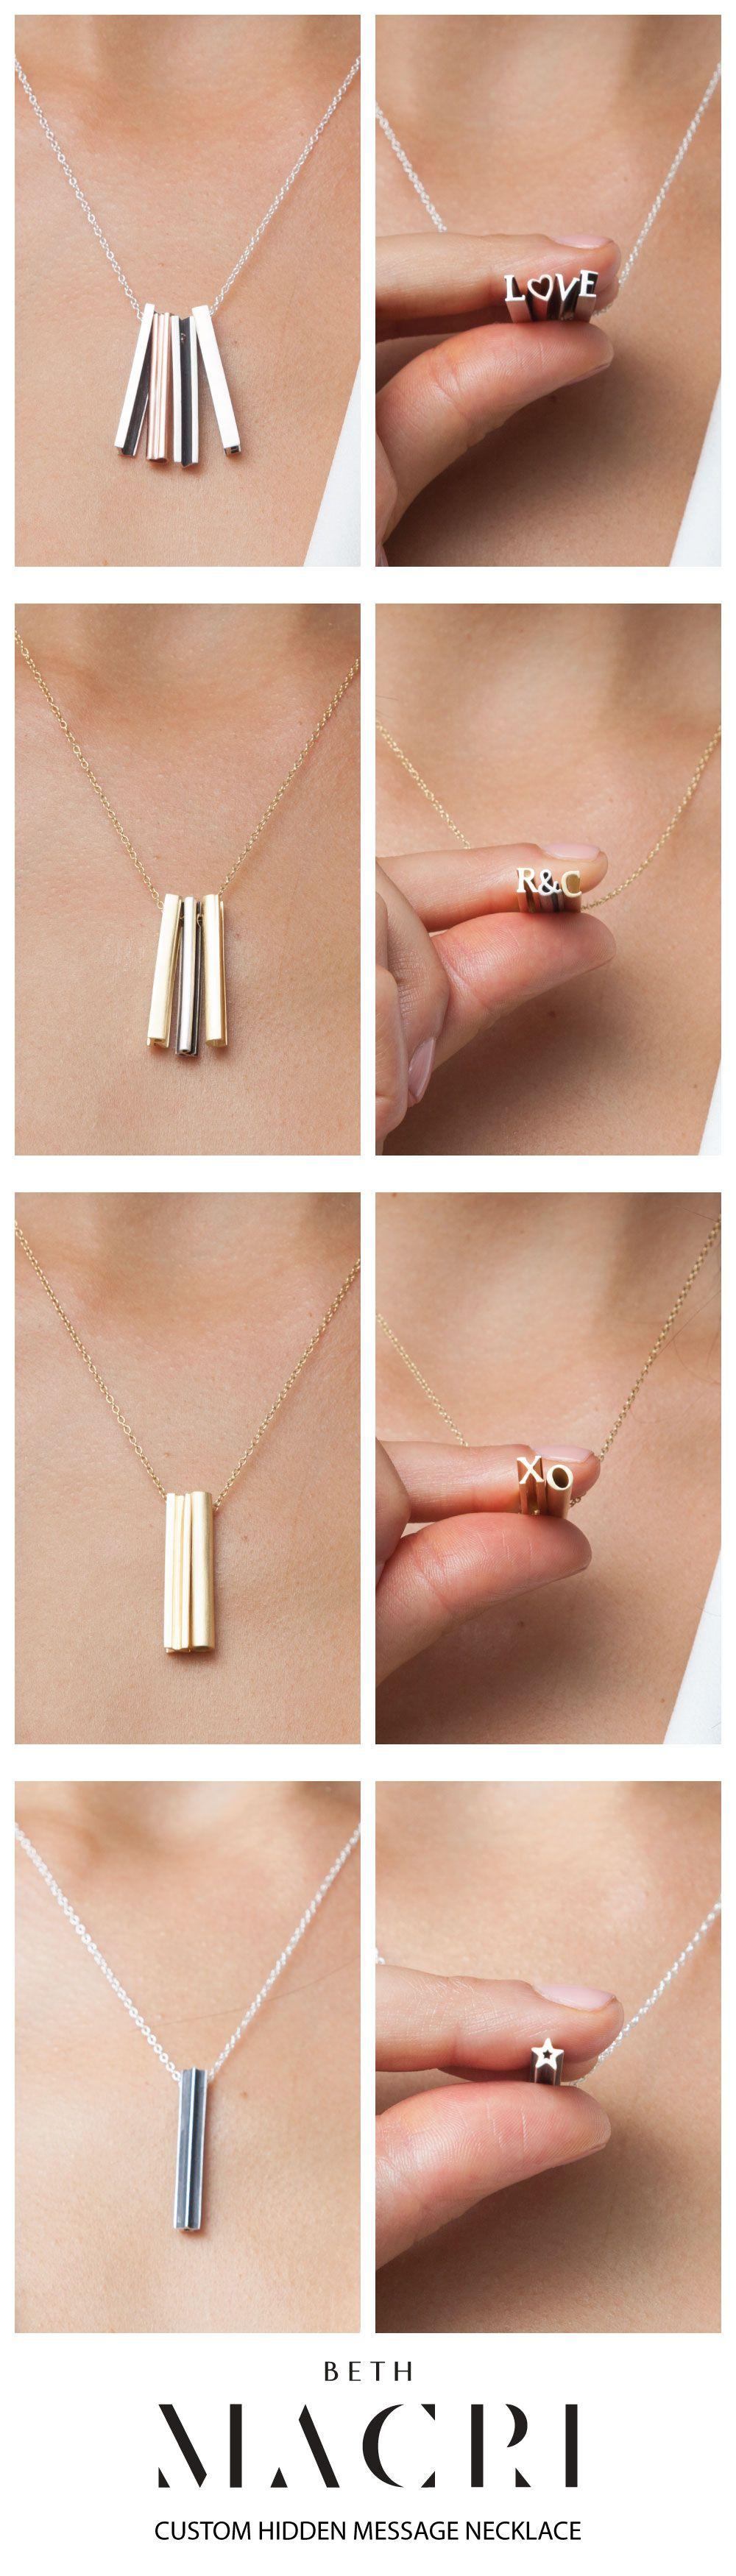 The Hidden Message Necklace